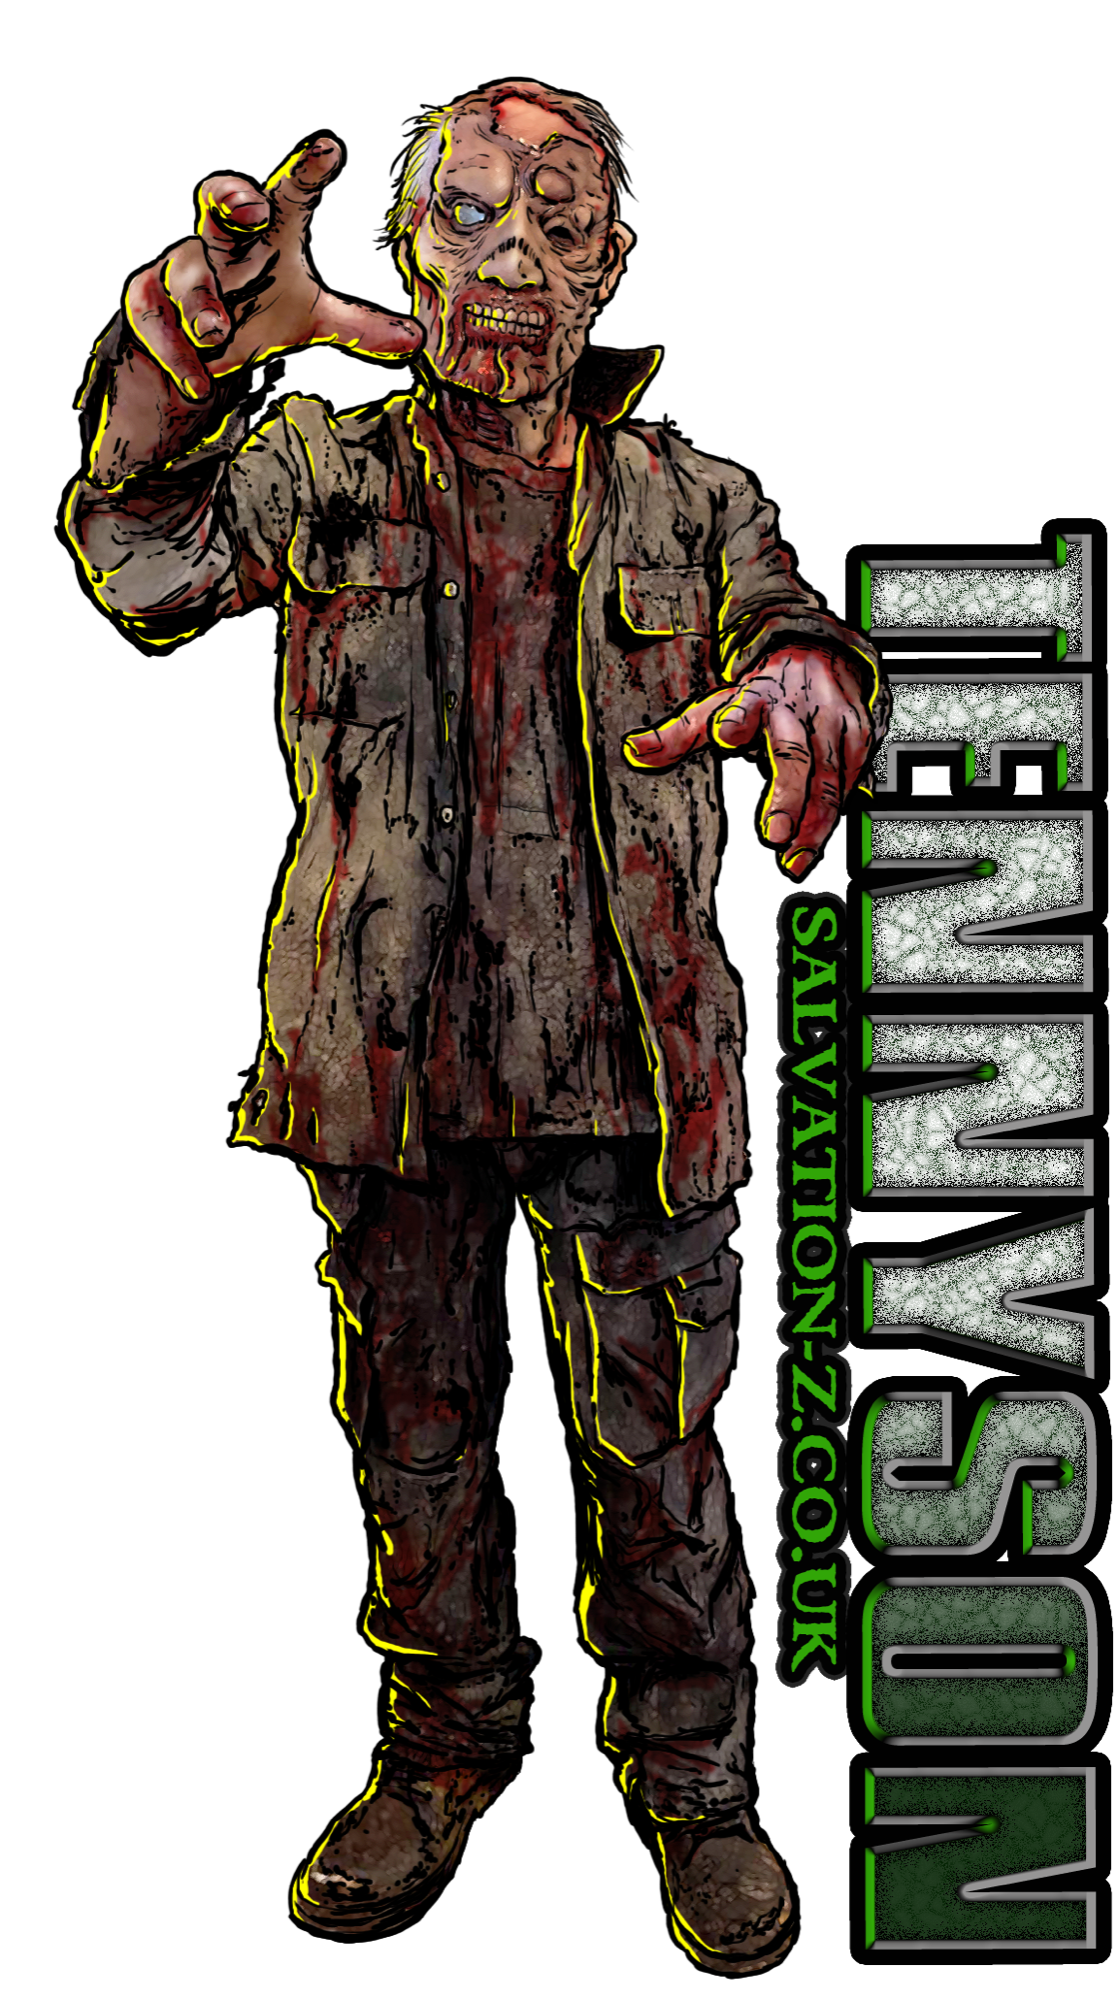 Tennyson Zombie